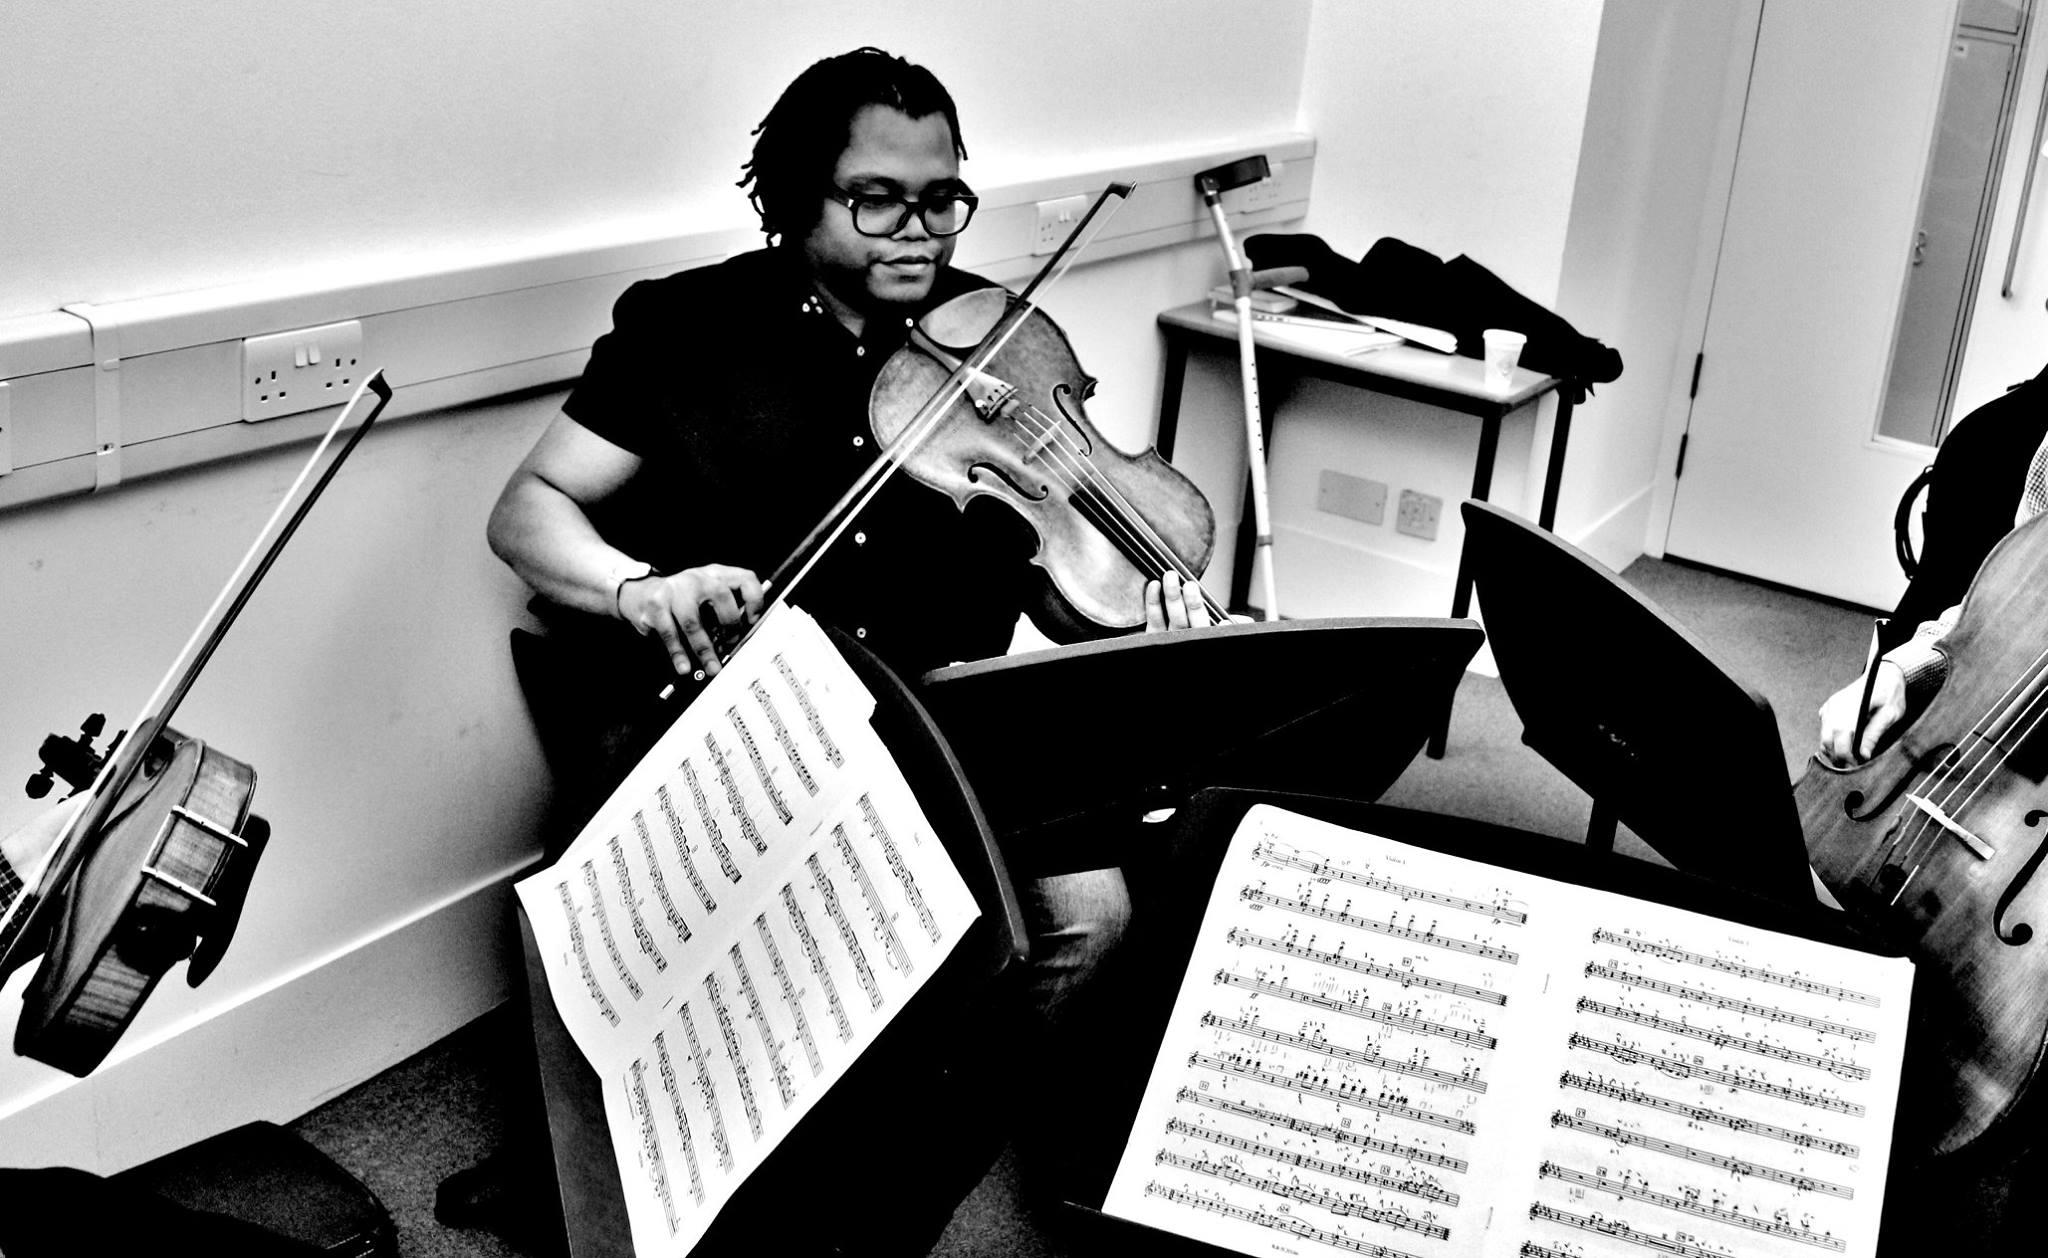 Kreutzer Quartet rehearsing Shostakovich 13